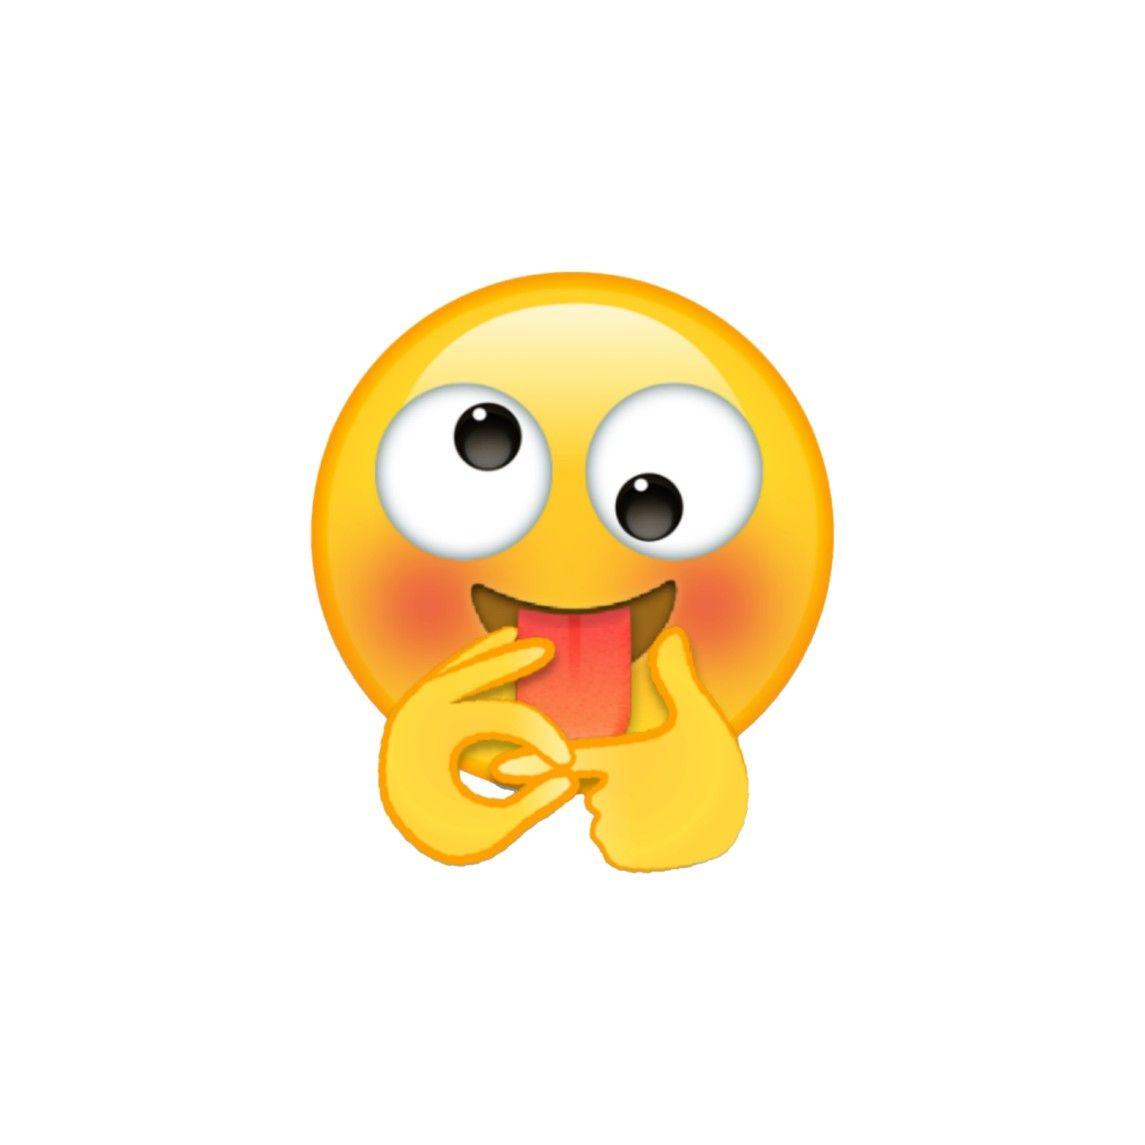 The moment of funny face for you.  #Funnystickers #laugh #funnyquotes #hindifunny #hindijokes #hindimotivational #hindicomedy #hindimeme #stickers #funnystickers #funnymemes #metime #pagal #doodledrawing #doodleideas #doodlingart #doodling #doodlesofinstagram #dontgetbored #boredaf #dosomethingdifferent #dosomething #sundayvibes #goodmorning #joy #mauchithecat #catstickers #lovecats #amantedelosgatos #stickersdegatos